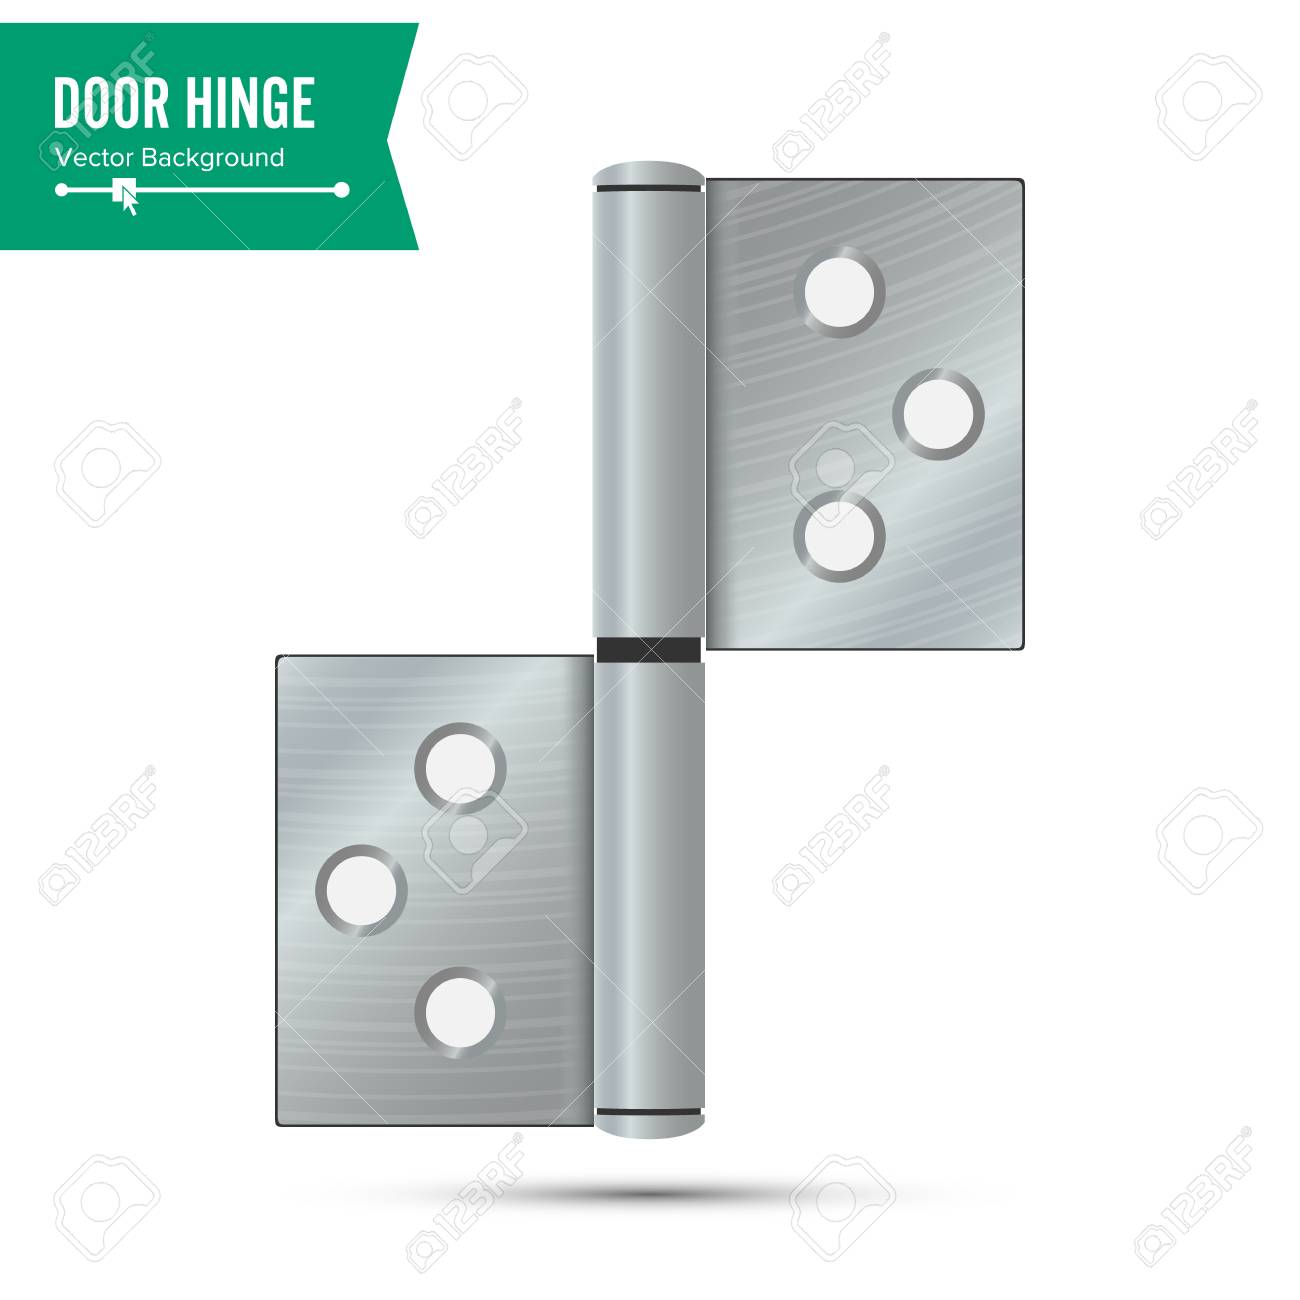 Door Hinge Vector Classic And Industrial Ironmongery Isolated